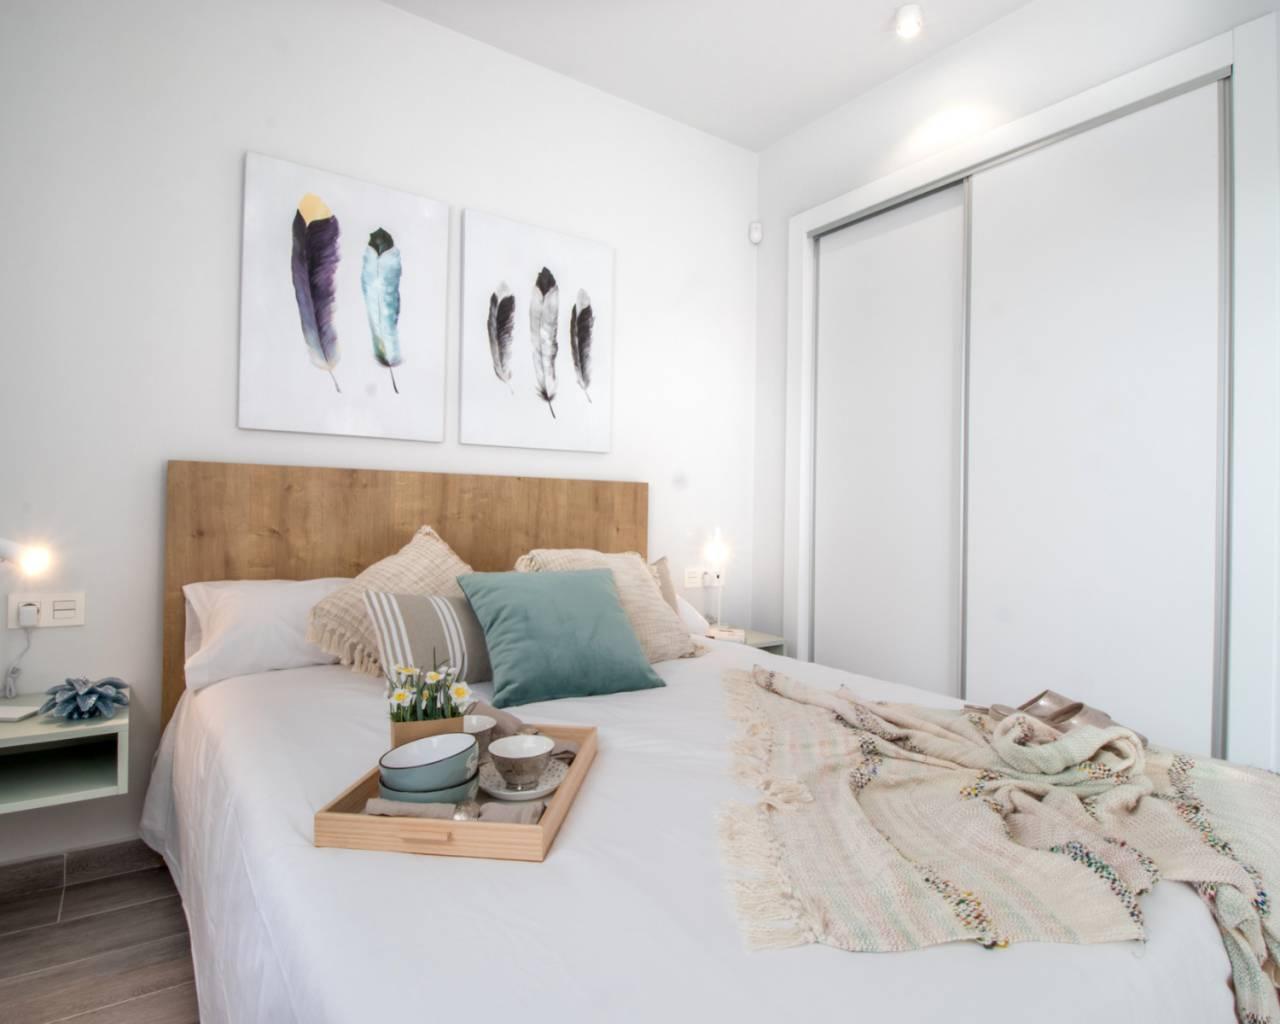 nieuwbouw-appartement-san-miguel-de-salinas_1791_xl